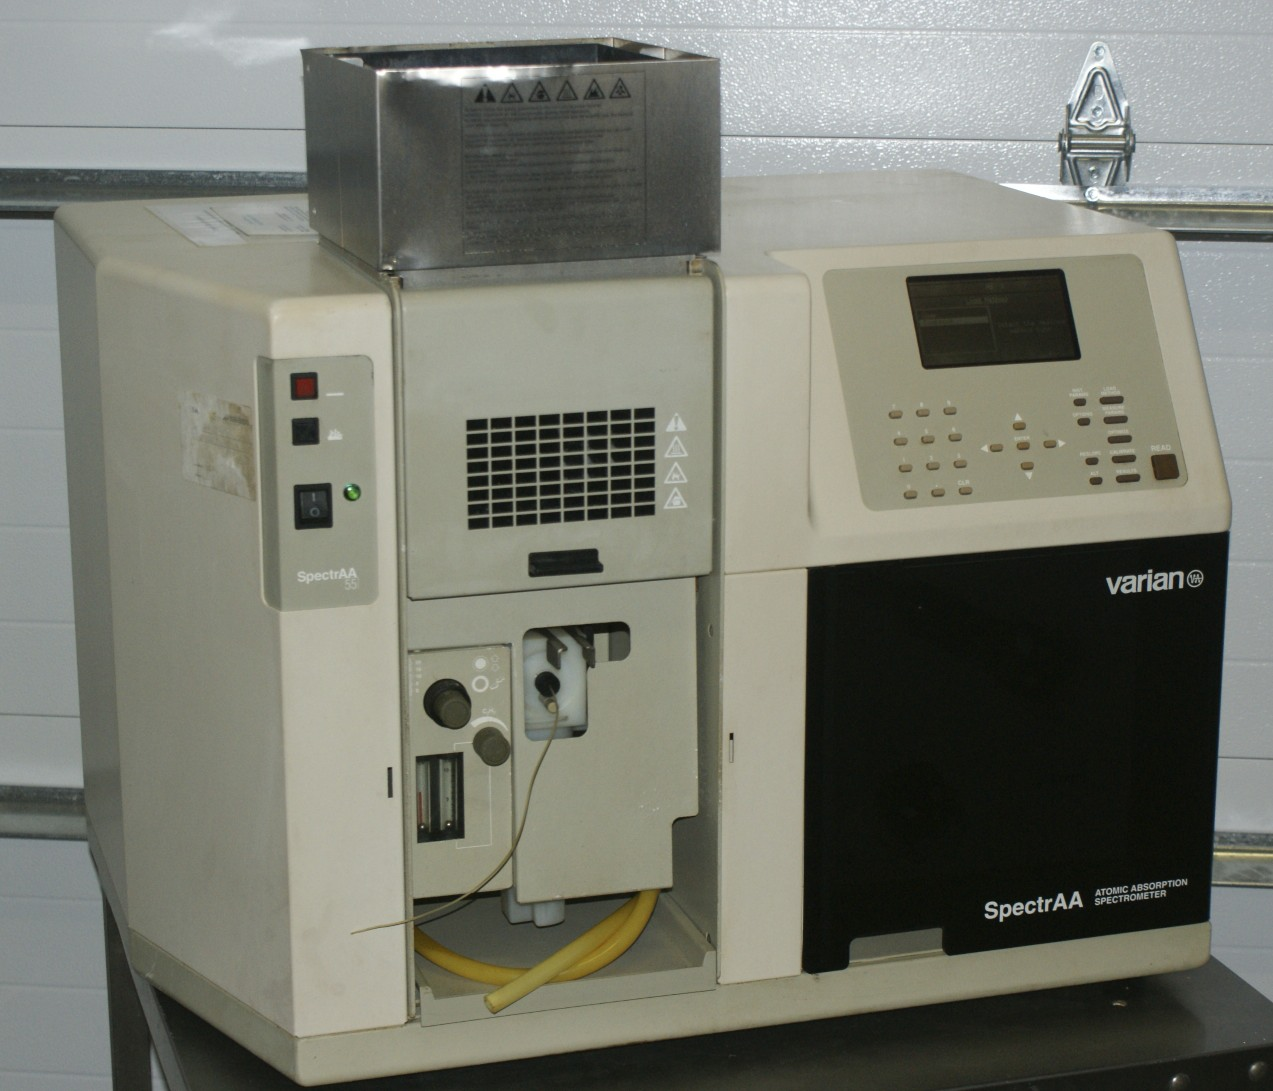 Varian SpectrAA 55 series double beam Atomic Absorption Spectrometer SpectrAA 55 used